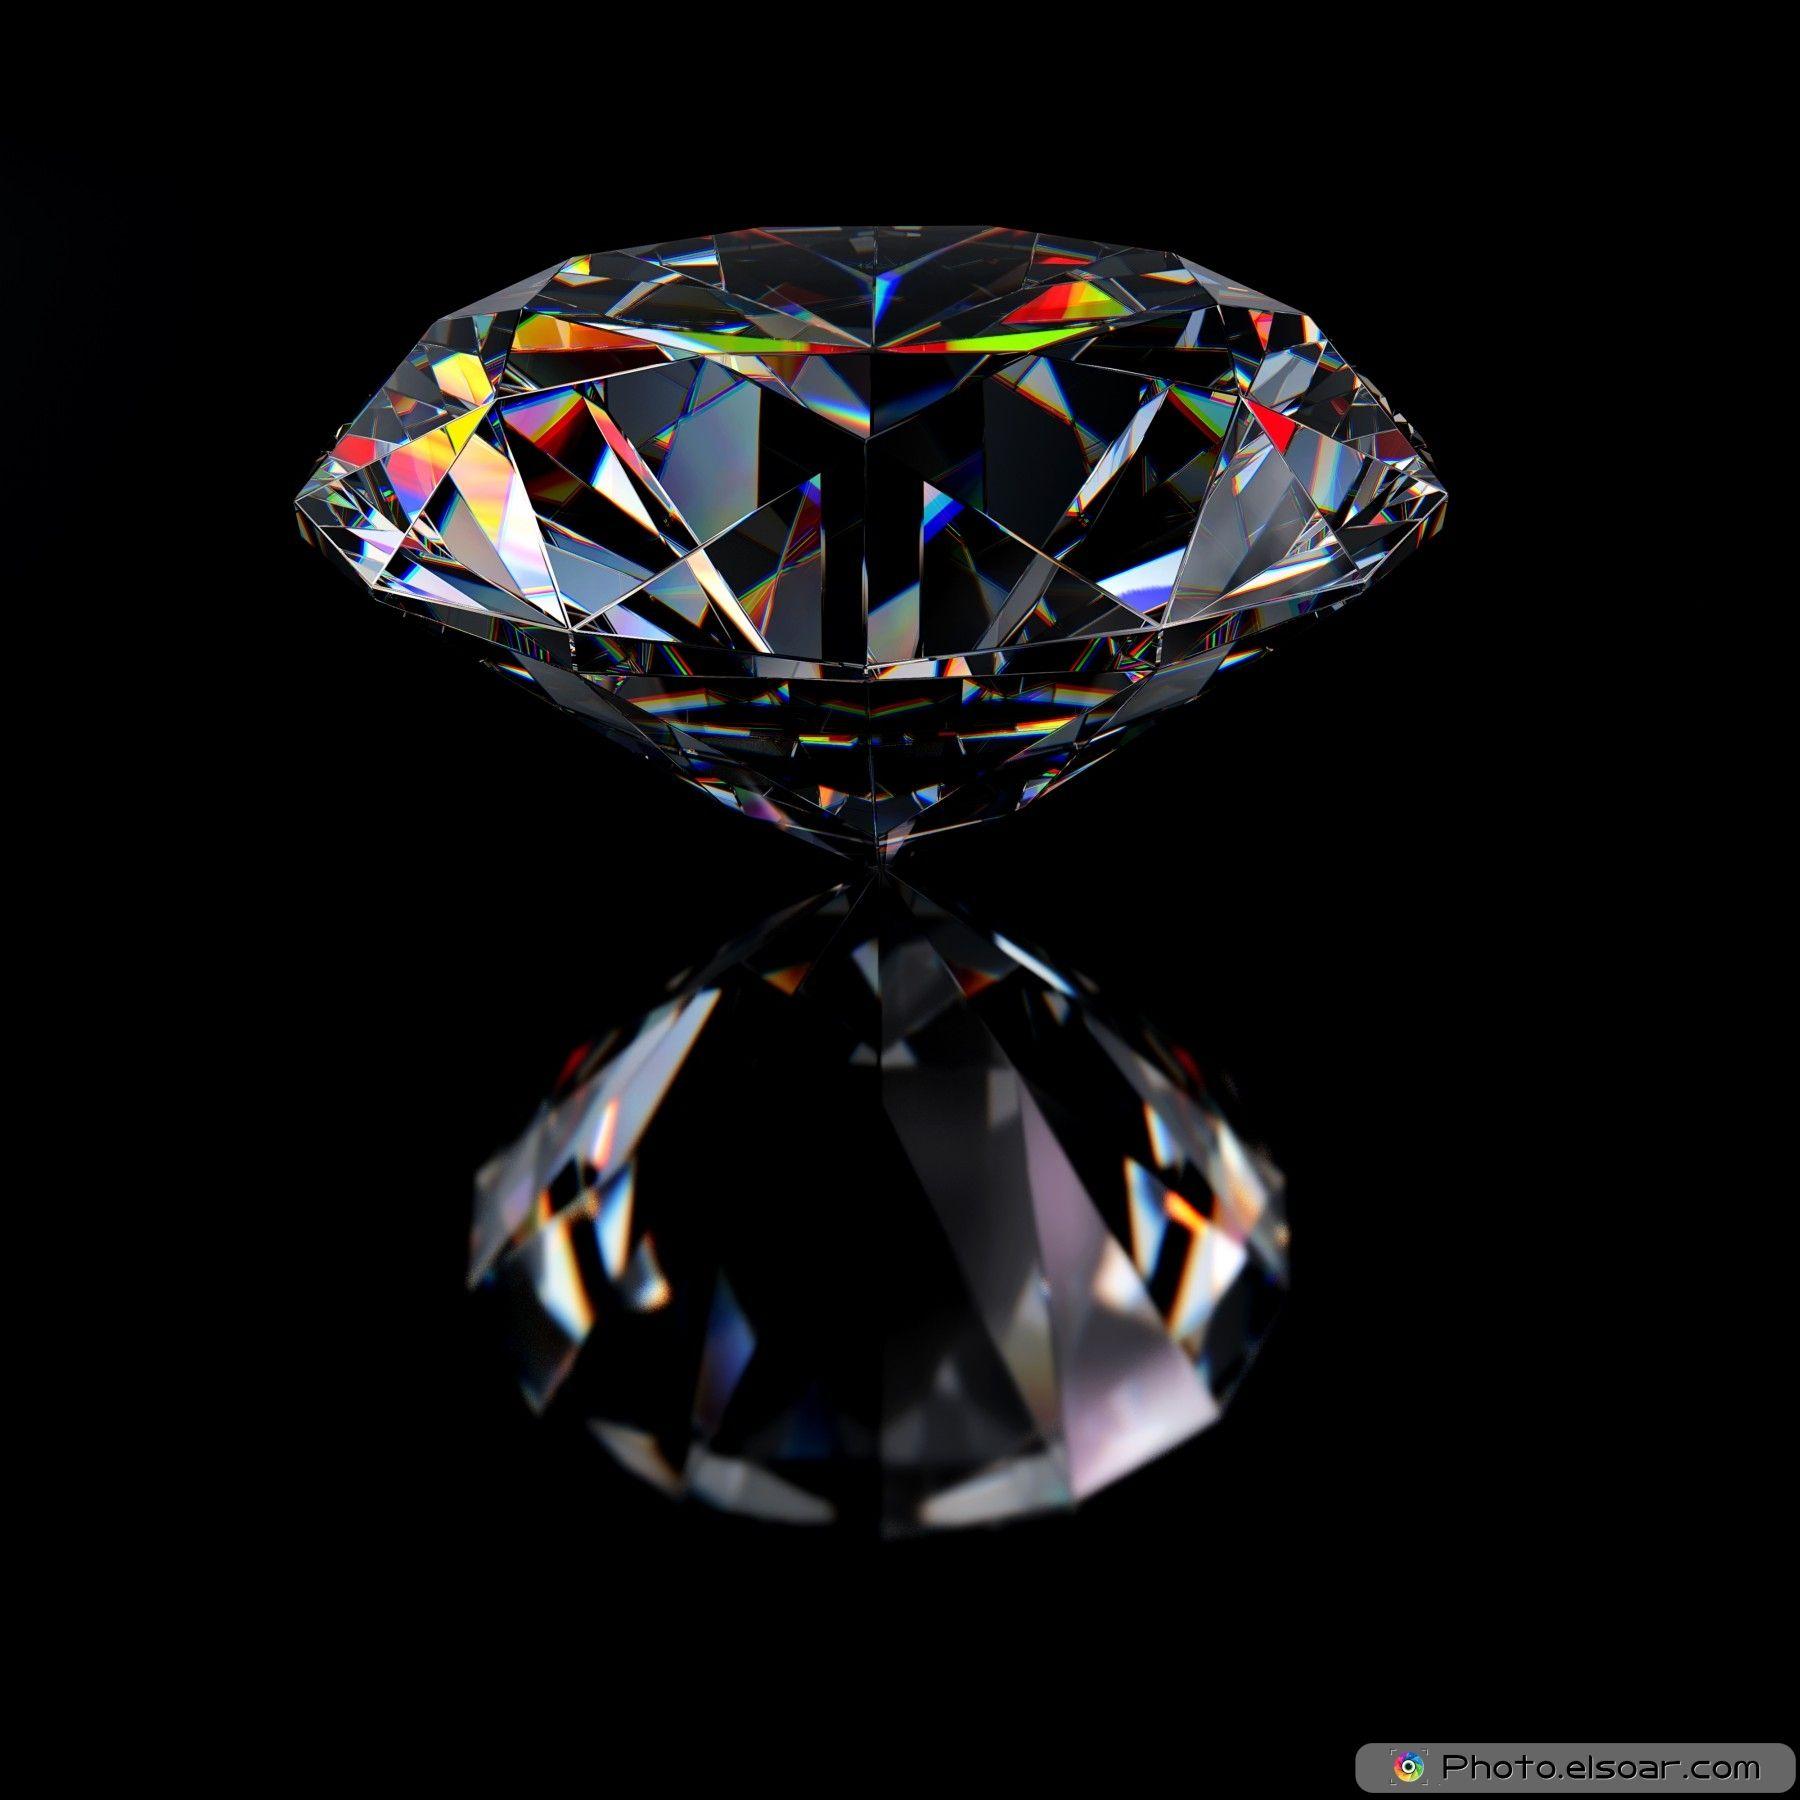 Wollpepar Diamond: Diamond Texture Light - Google Search